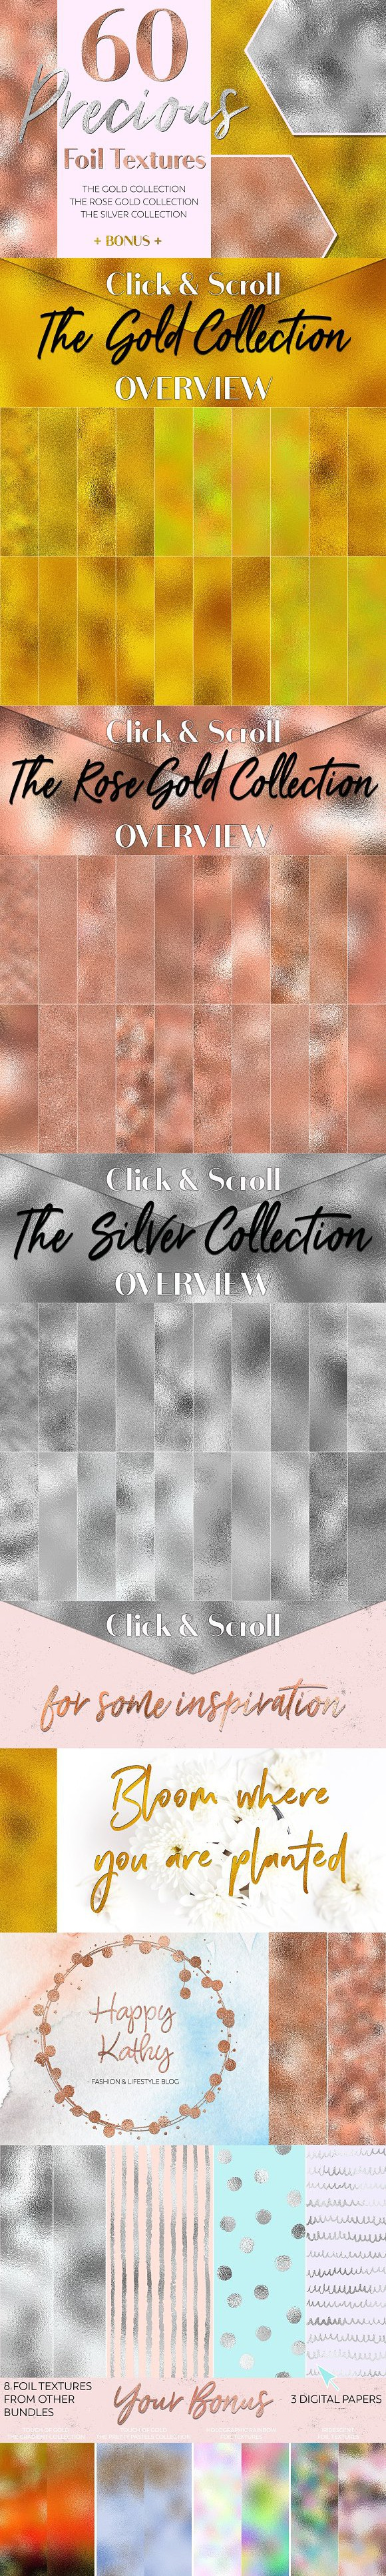 60 Precious Foil Textures. Holographic Backgrounds